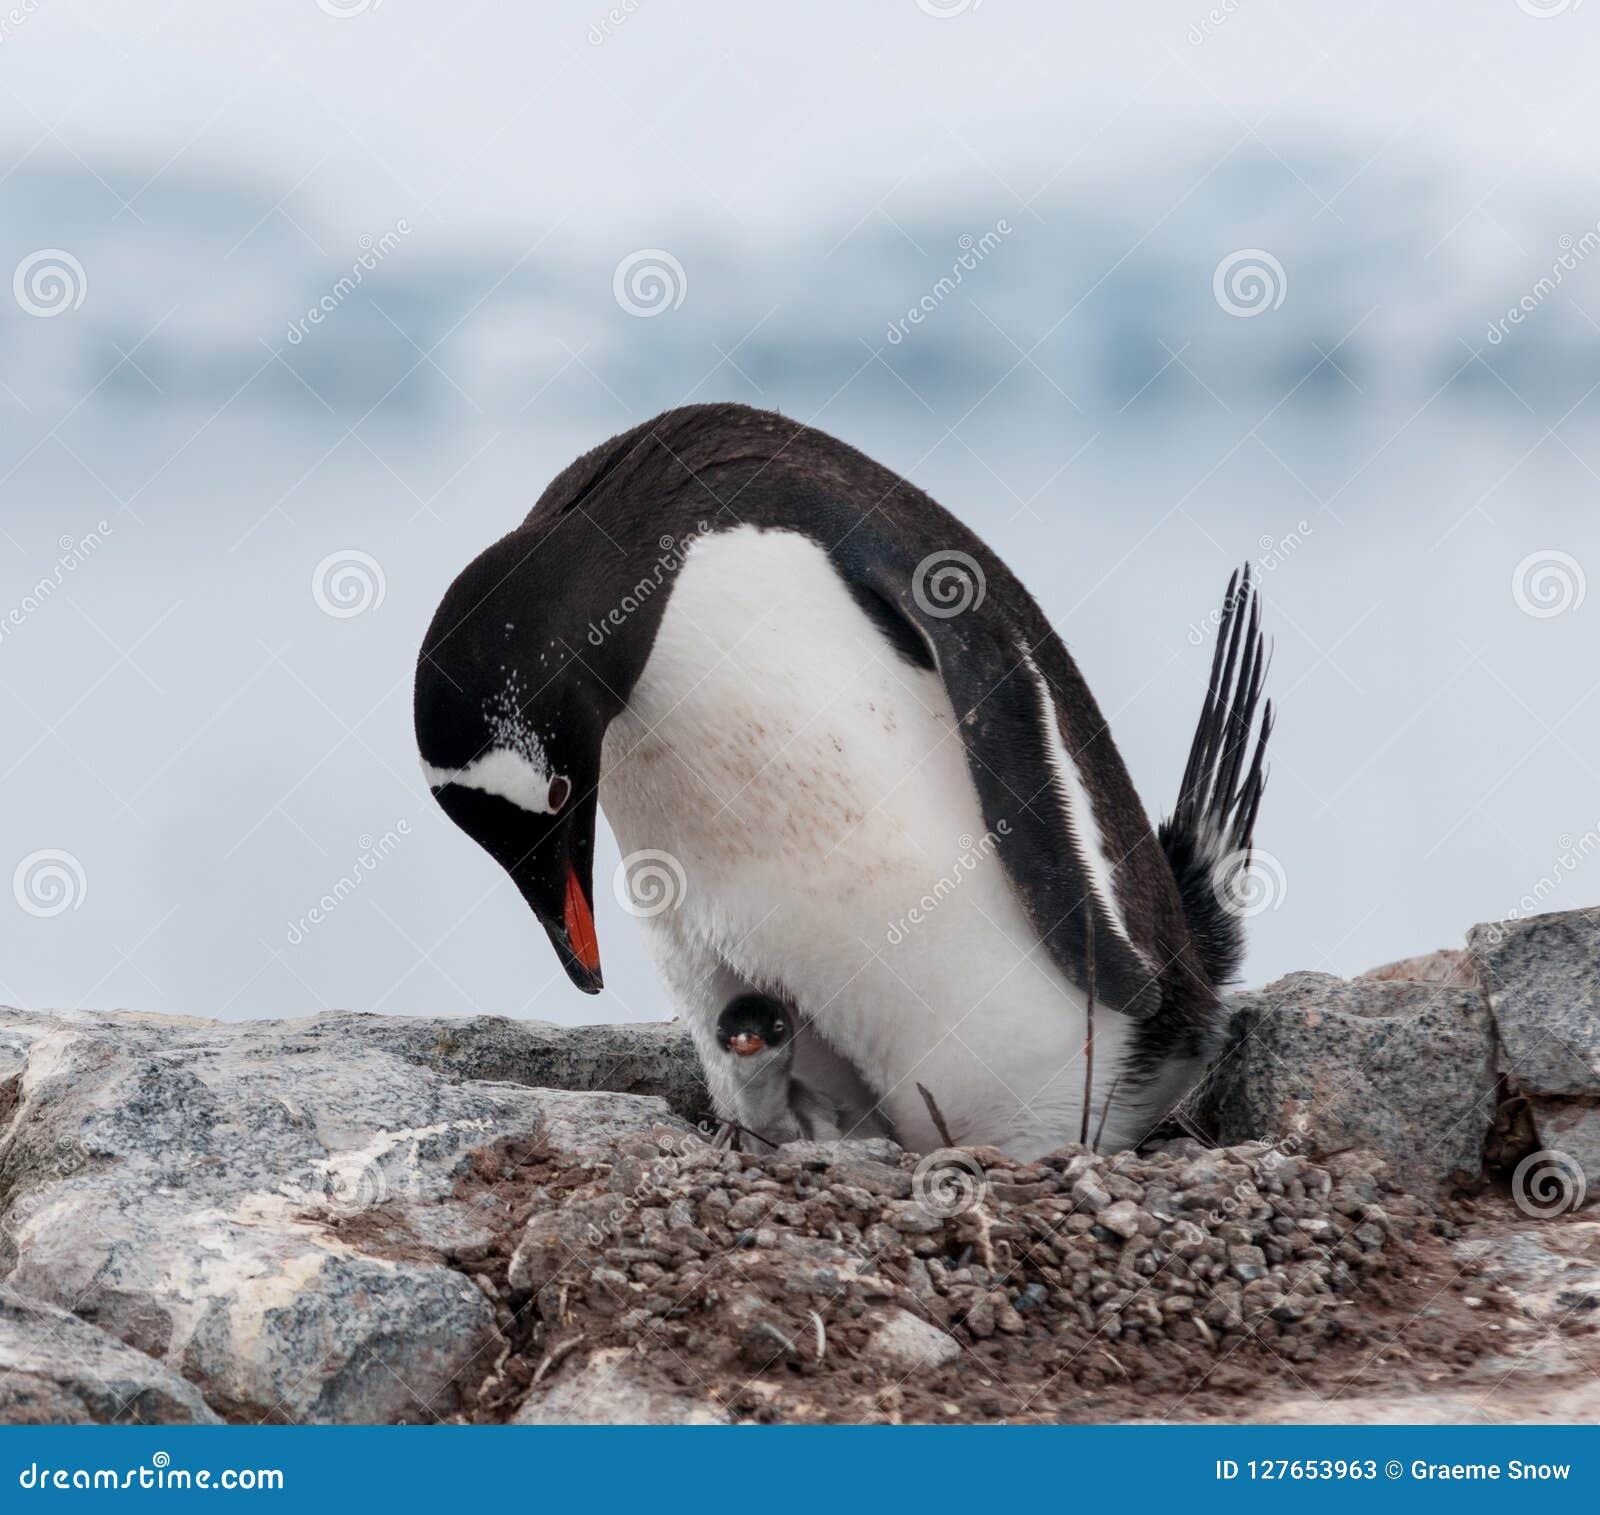 Nesting adult Gentoo Penguin with young chick, Antarctic Peninsula